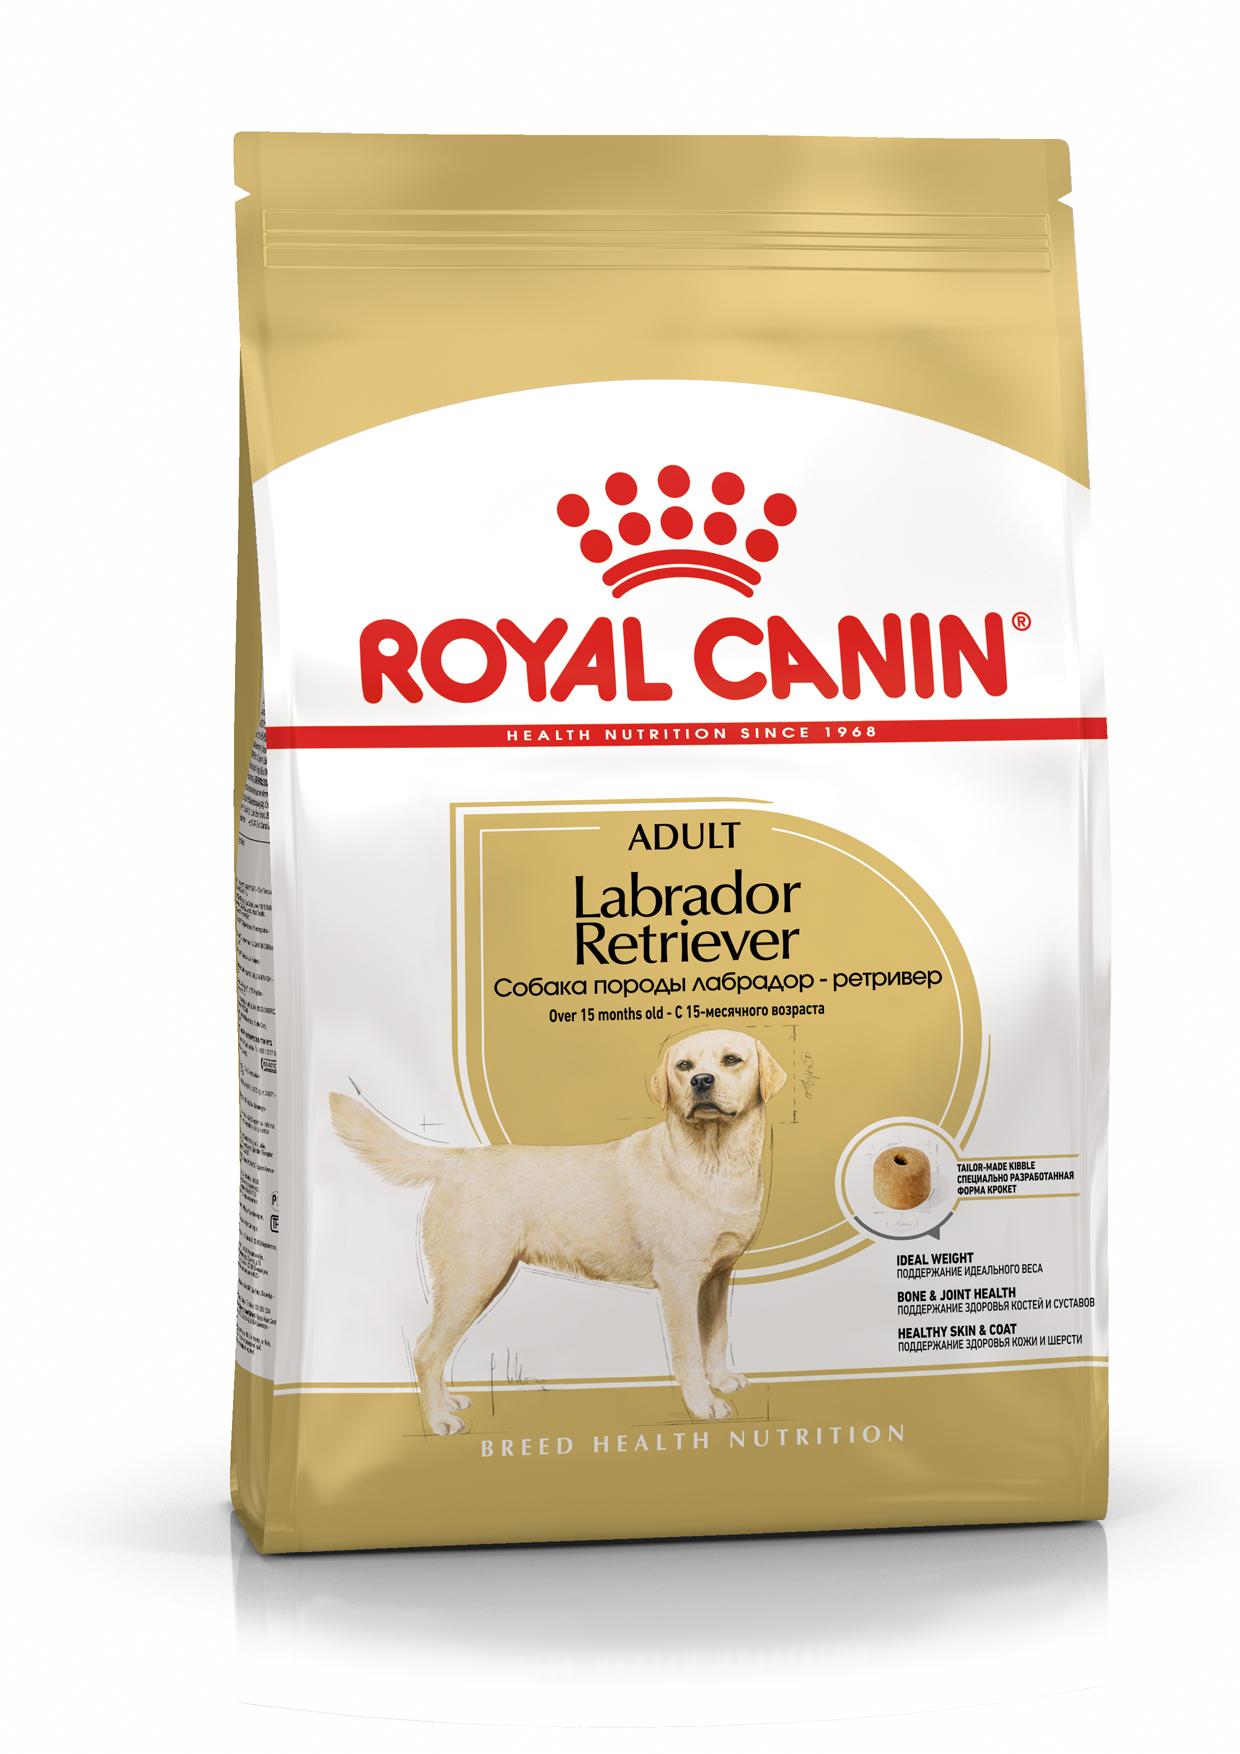 Royal Canin Корм для взрослых собак породы лабрадор-ретривер, Royal Canin Labrador Retriever Adult 4627109383955_1.png